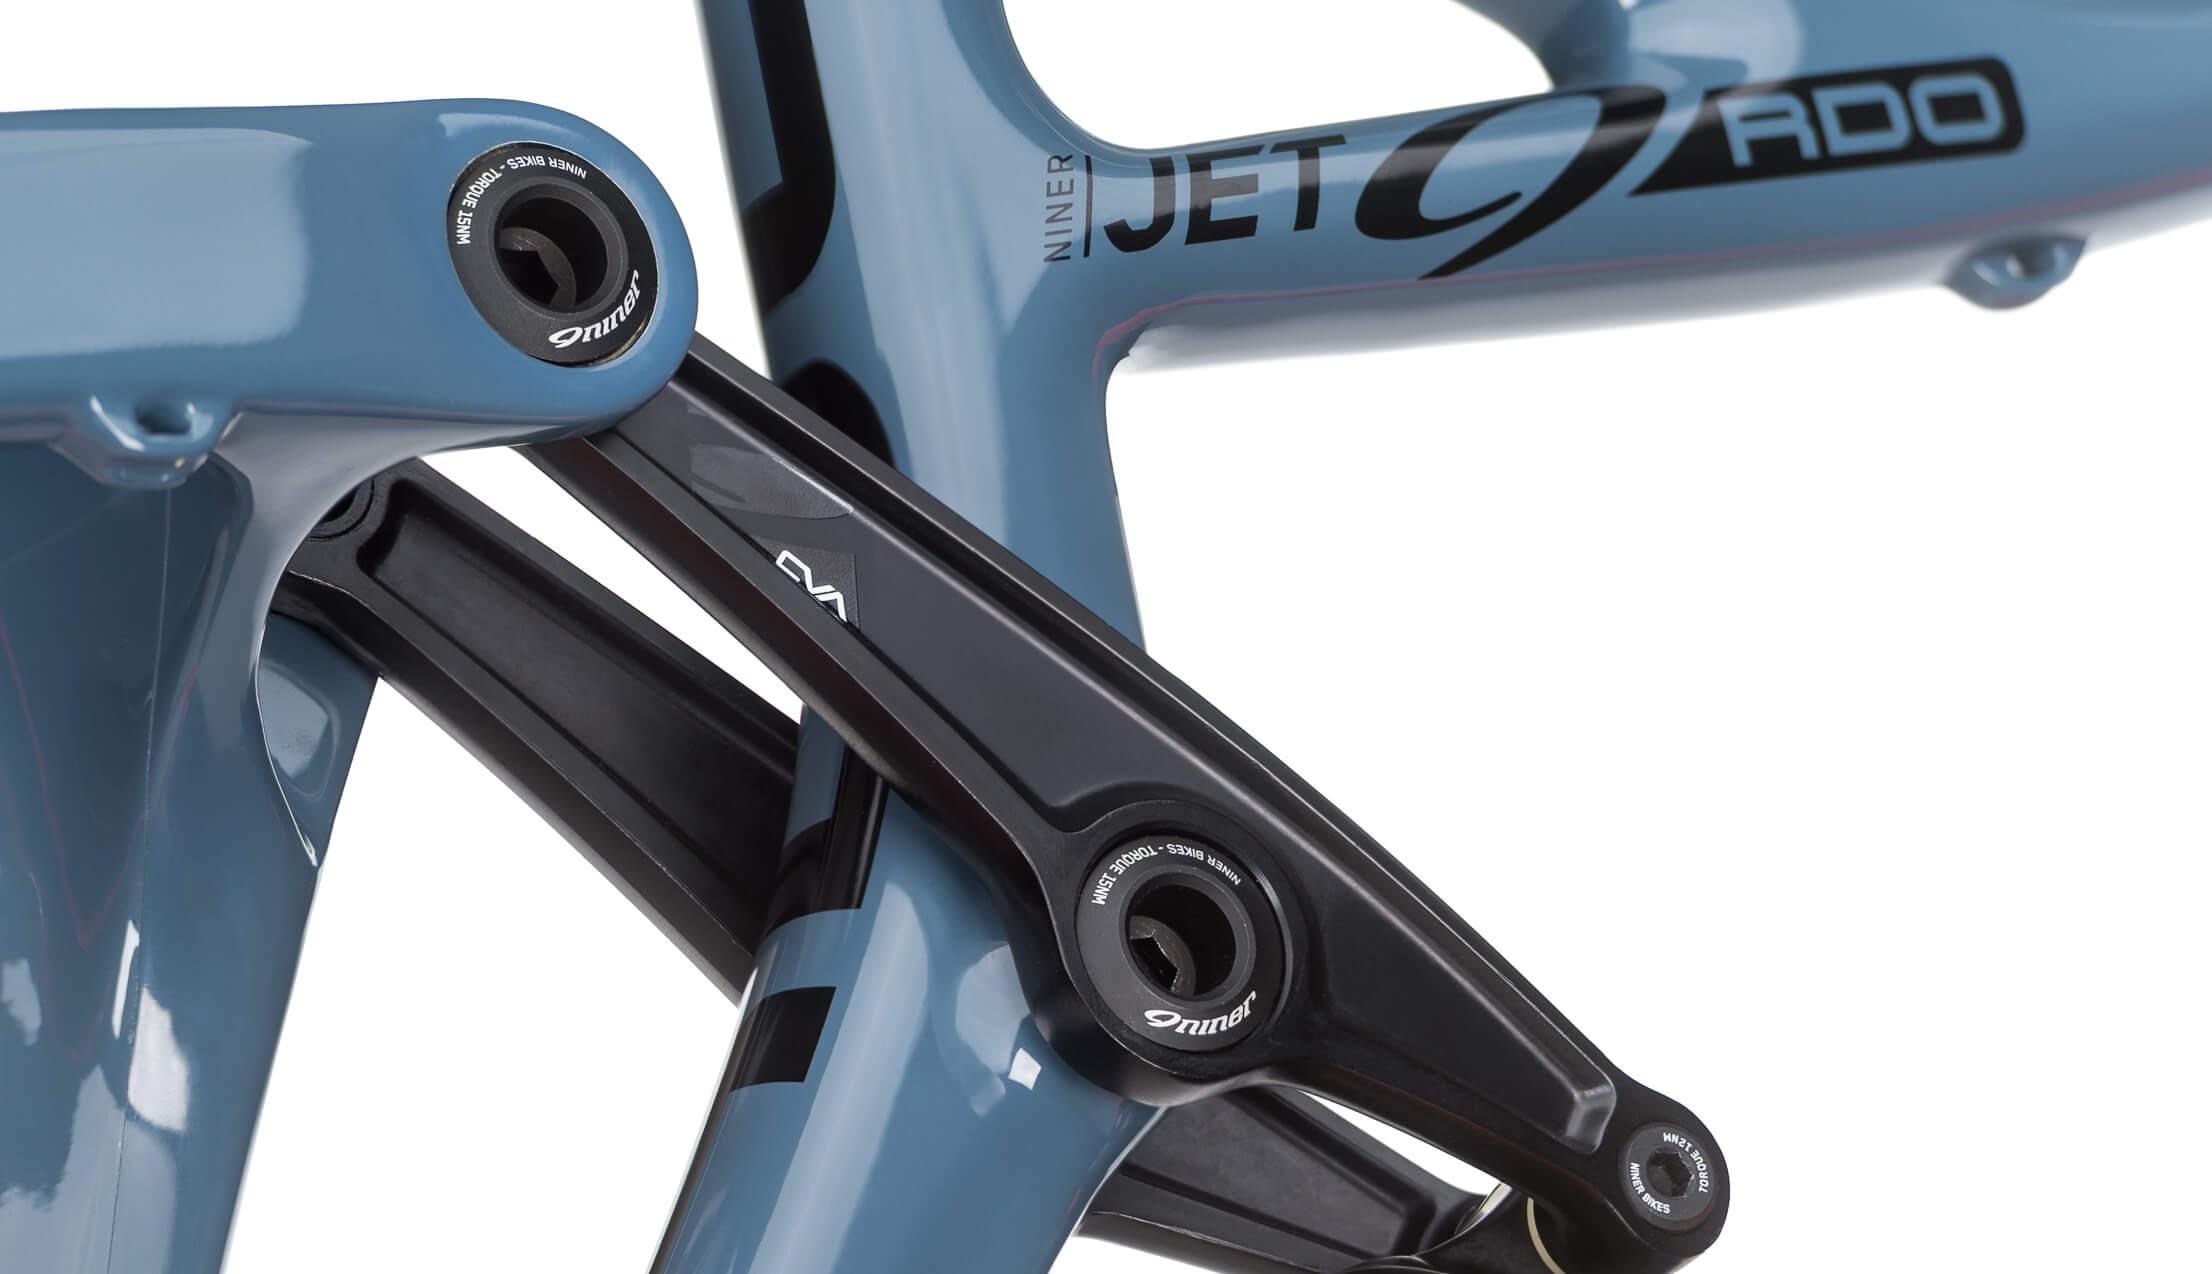 Niner JET 9 RDO 3-Star Build Slate/Orange Medium Upper Pivot Closeup